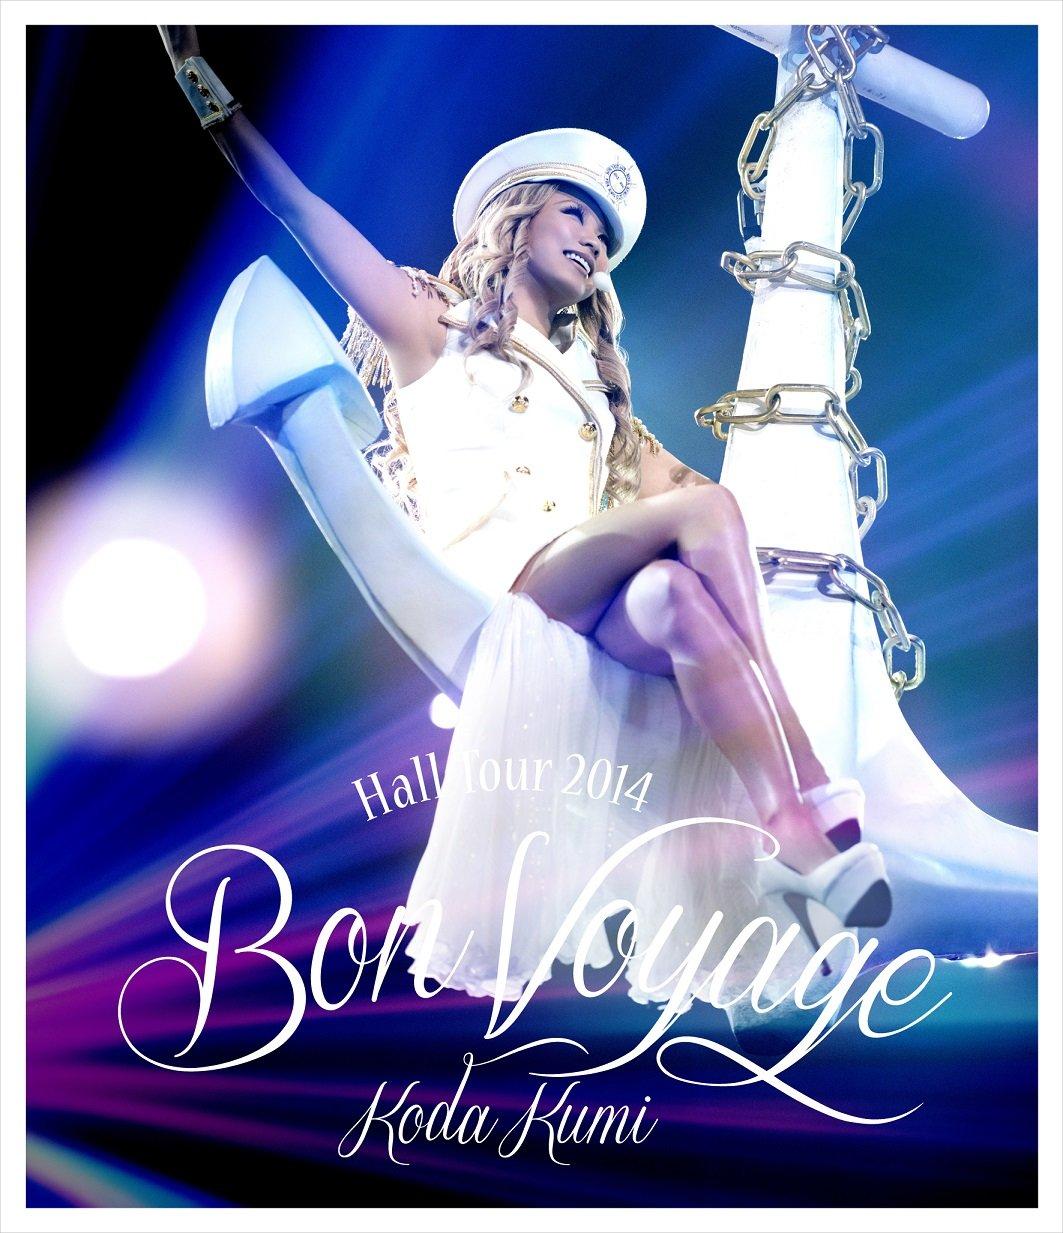 [Blu-ray/ISO] Koda Kumi 倖田來未 – Koda Kumi Hall Tour 2014 ~Bon Voyage~